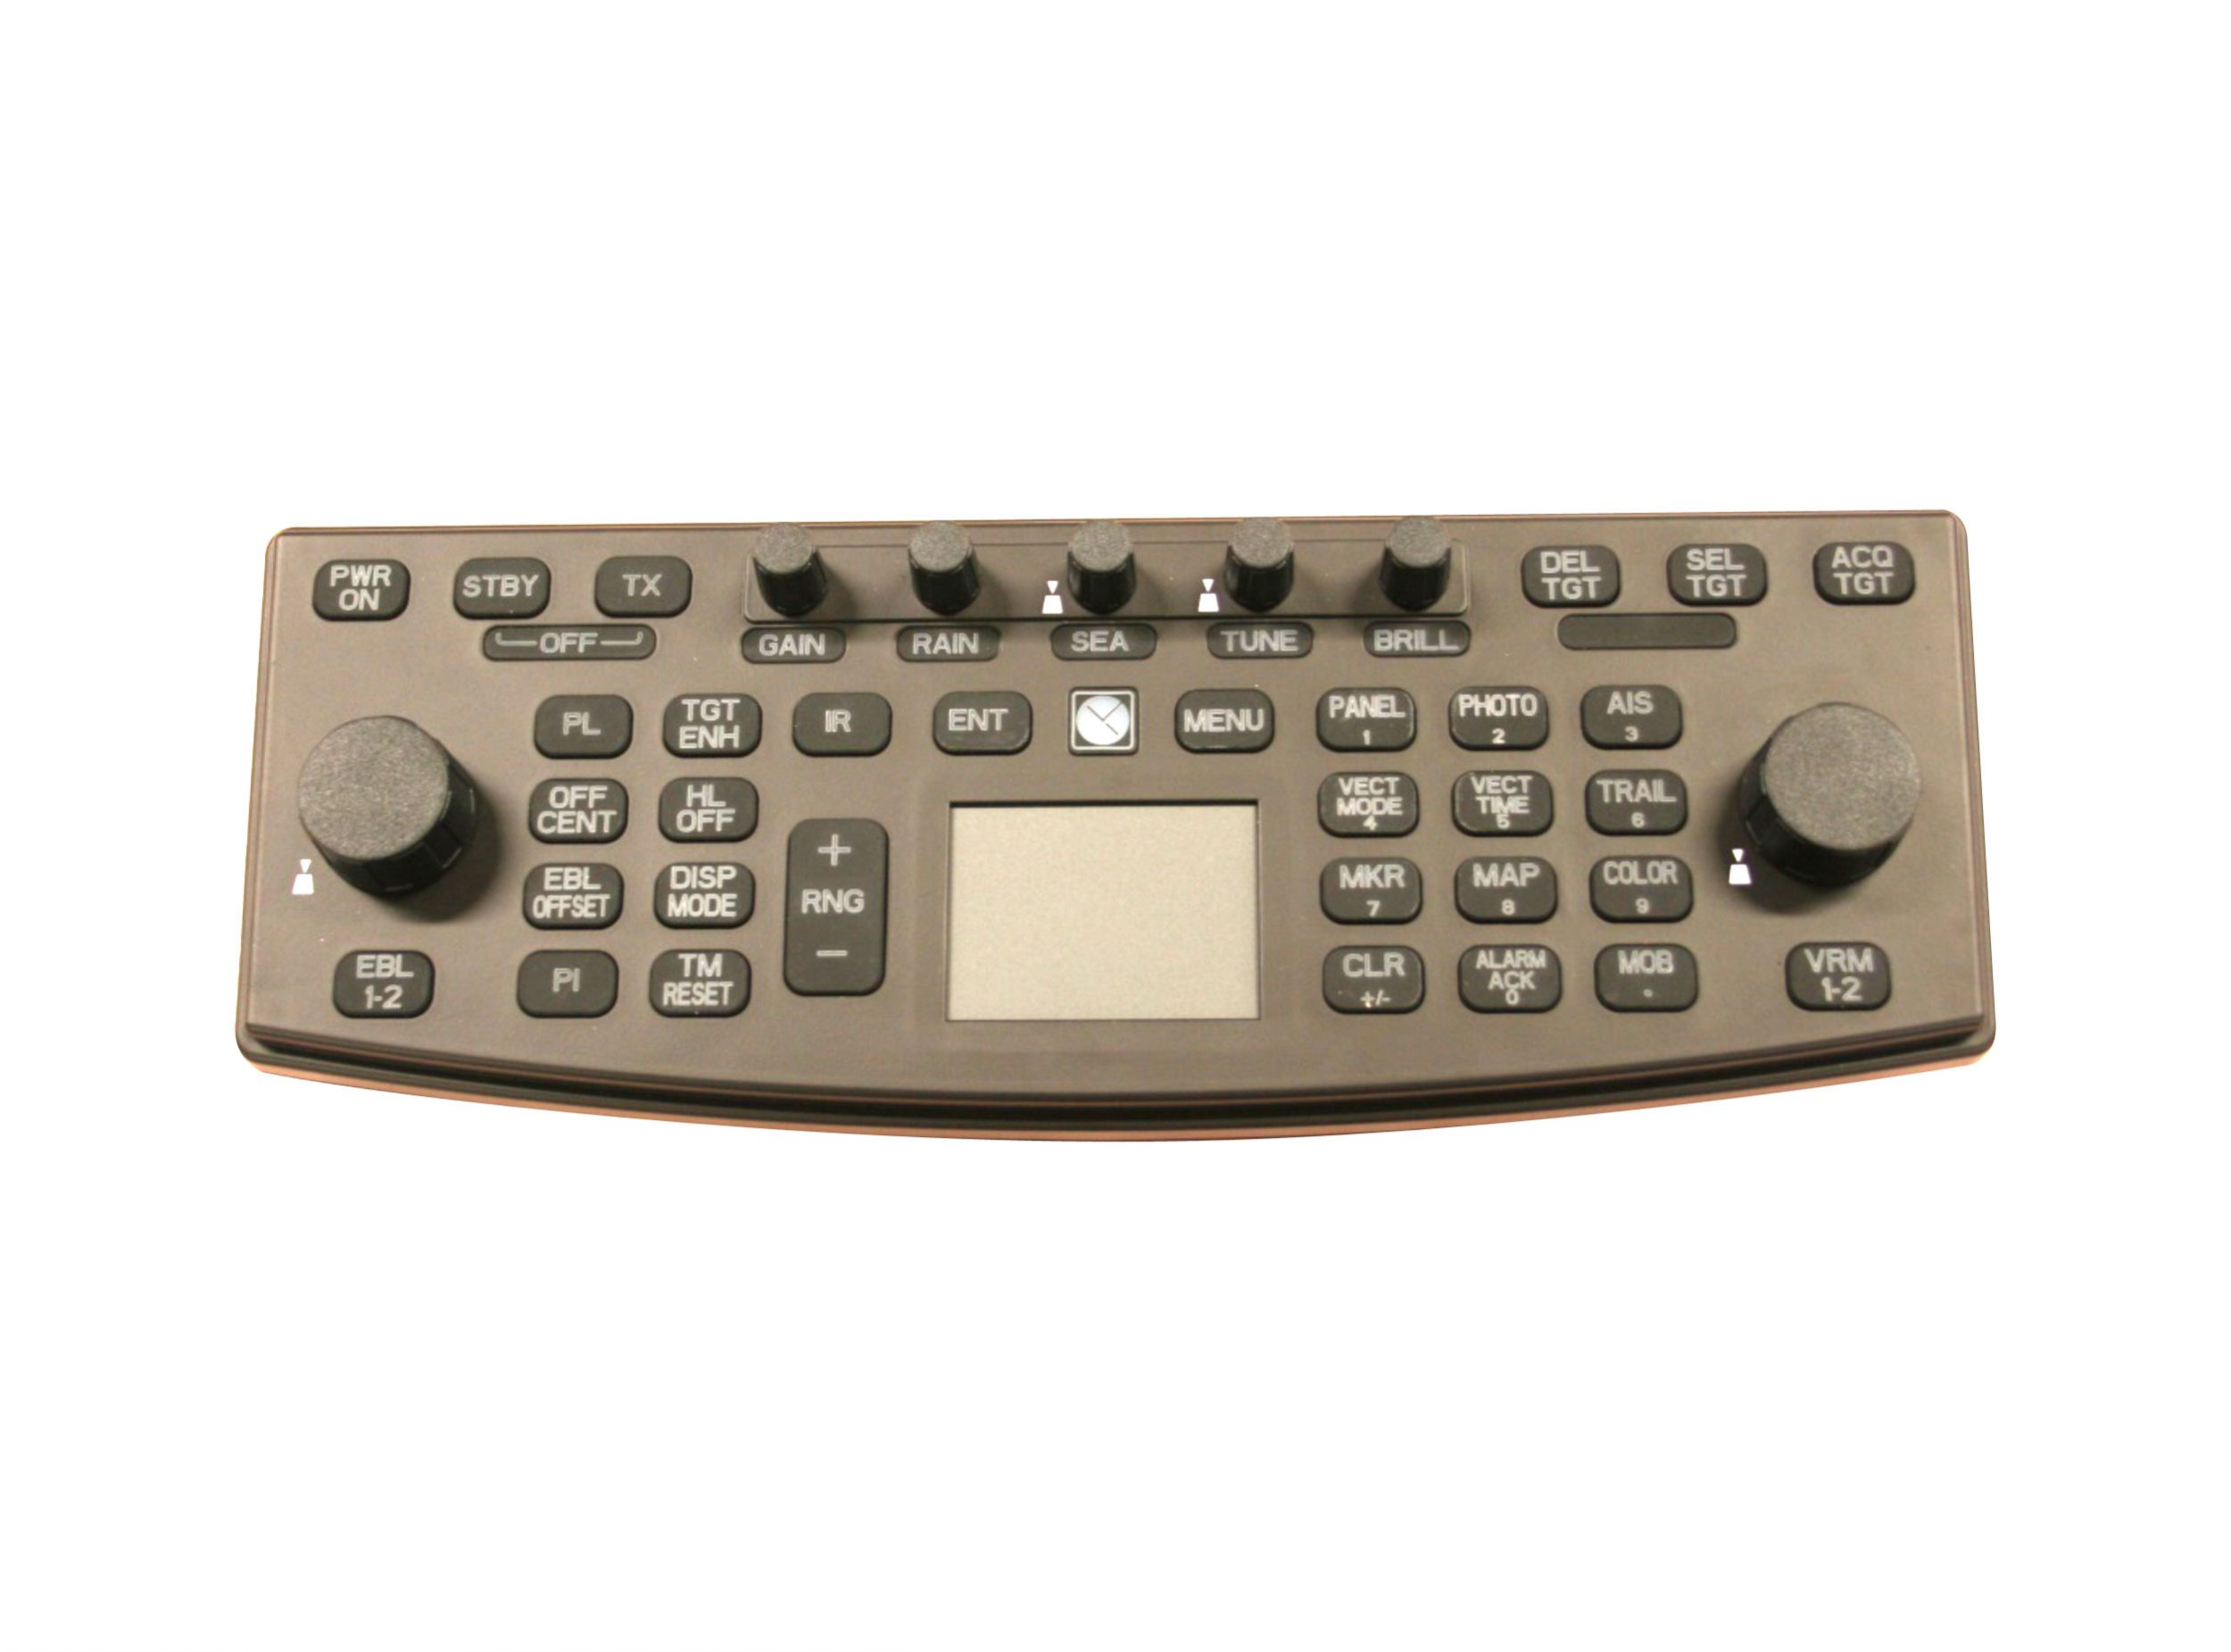 RADAR-ECDIS-Keyboard